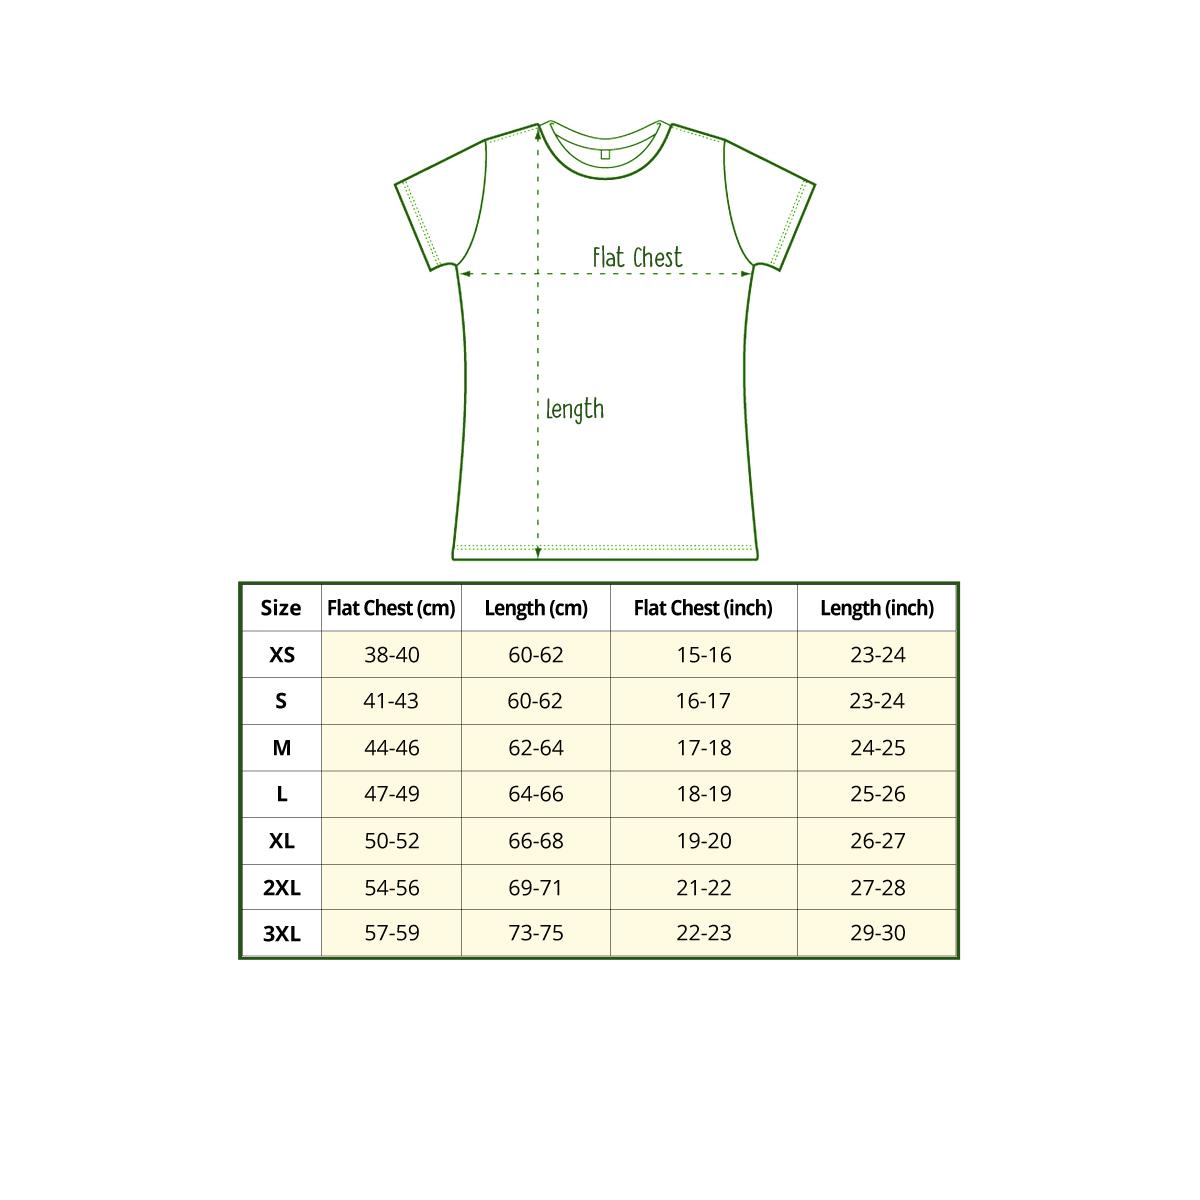 Boss 302 Mustang Old School Women T-shirt XS-3XL